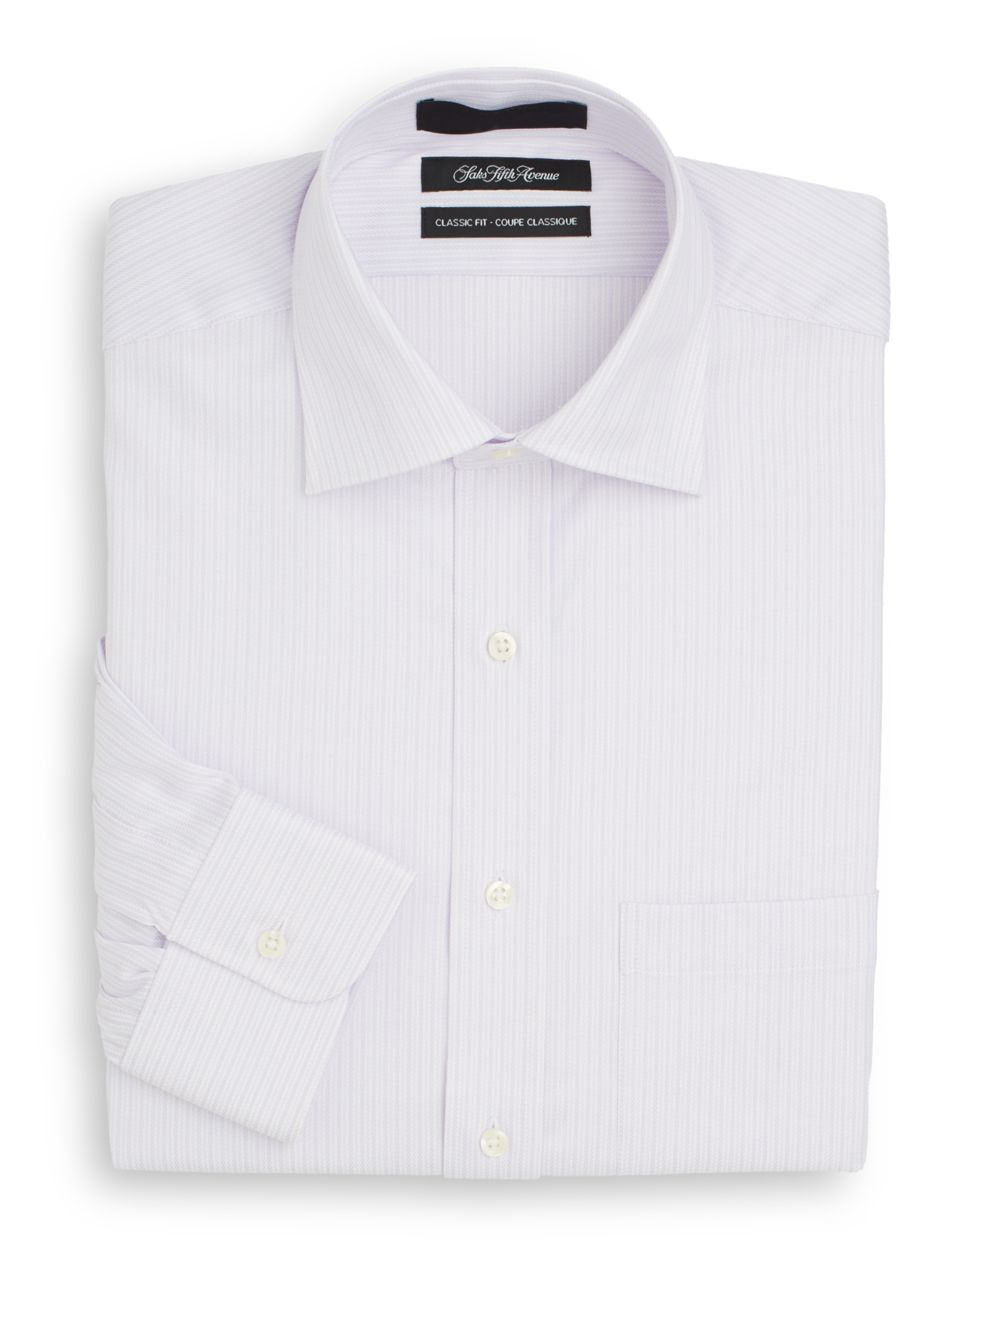 Saks Fifth Avenue Classic Fit Striped Cotton Dress Shirt